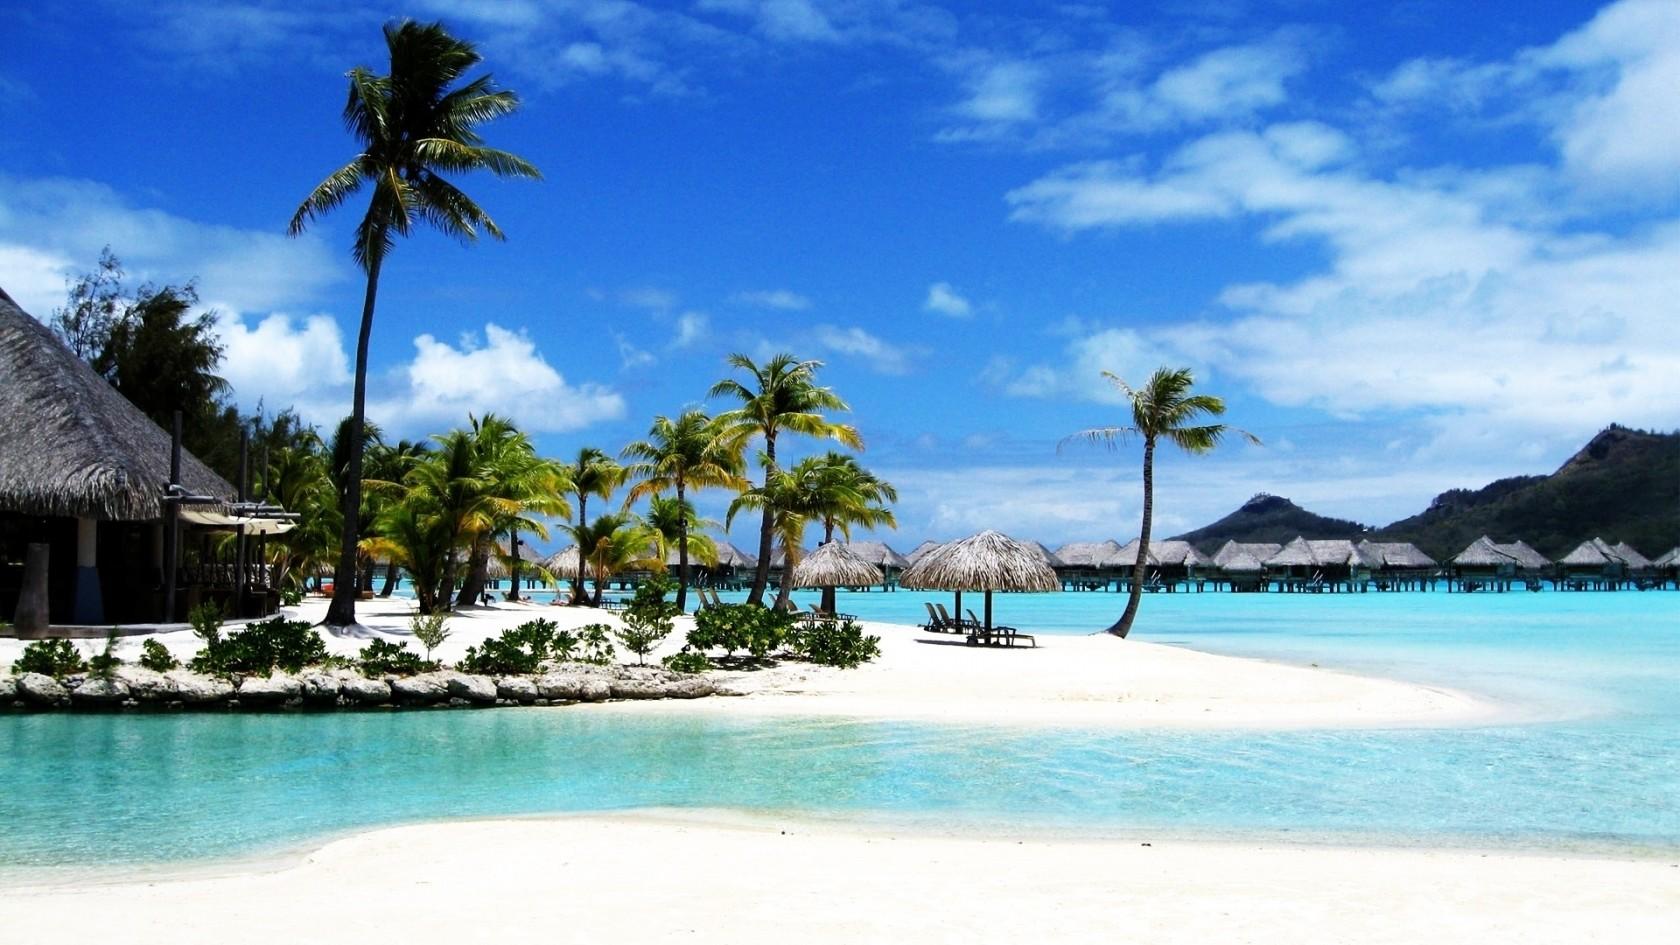 Hd wallpaper beach - Tropical Beach Resort Hd Wallpaper Tropical Beach Resort